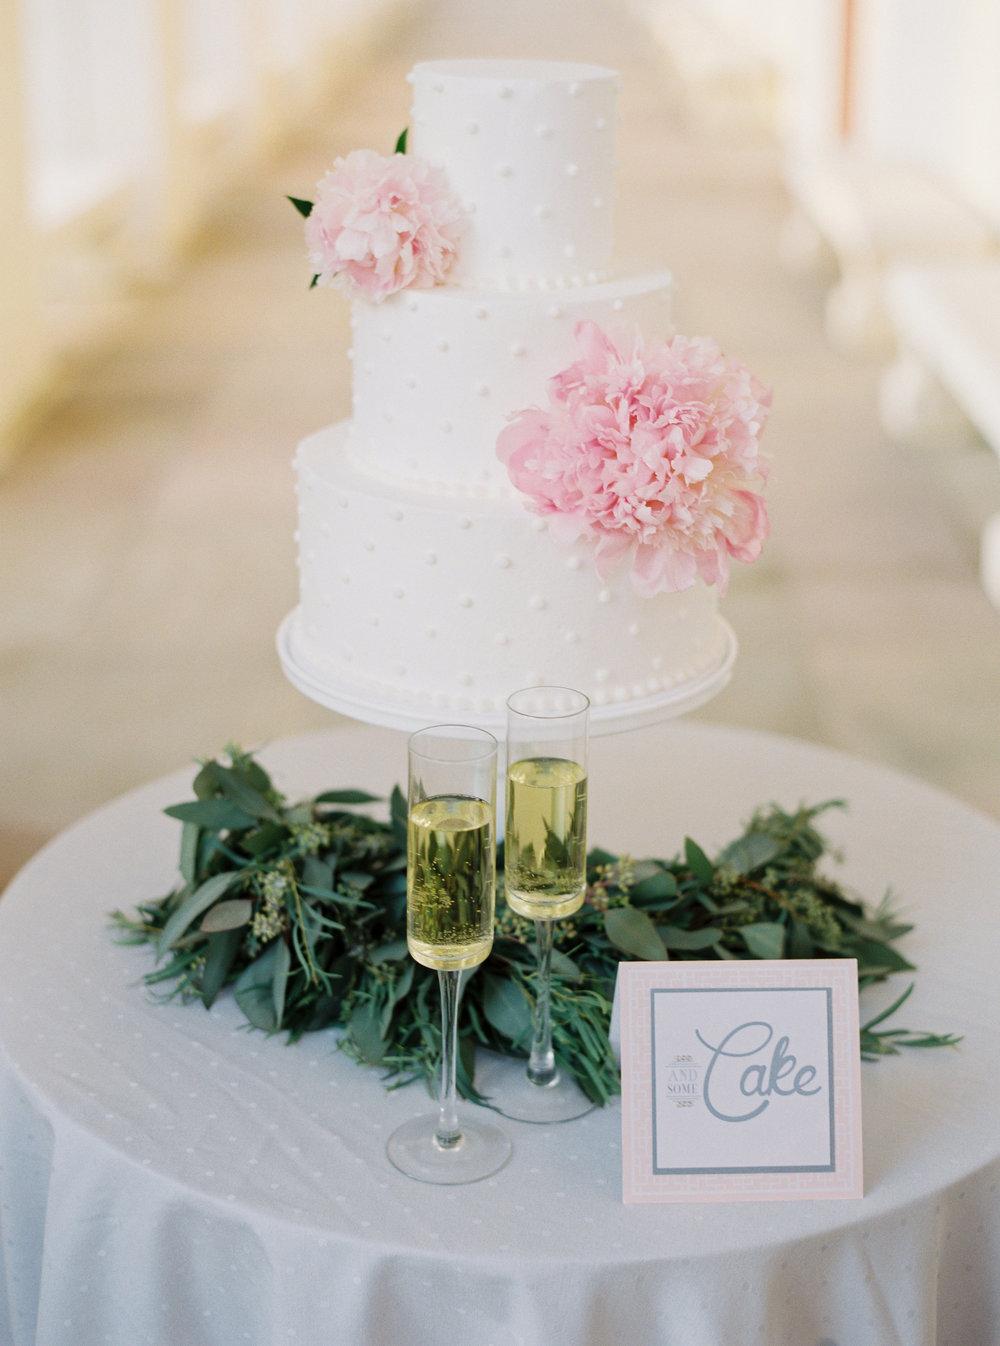 custom-wedding-cake-white-swissdots-sugarbeesweets.jpg